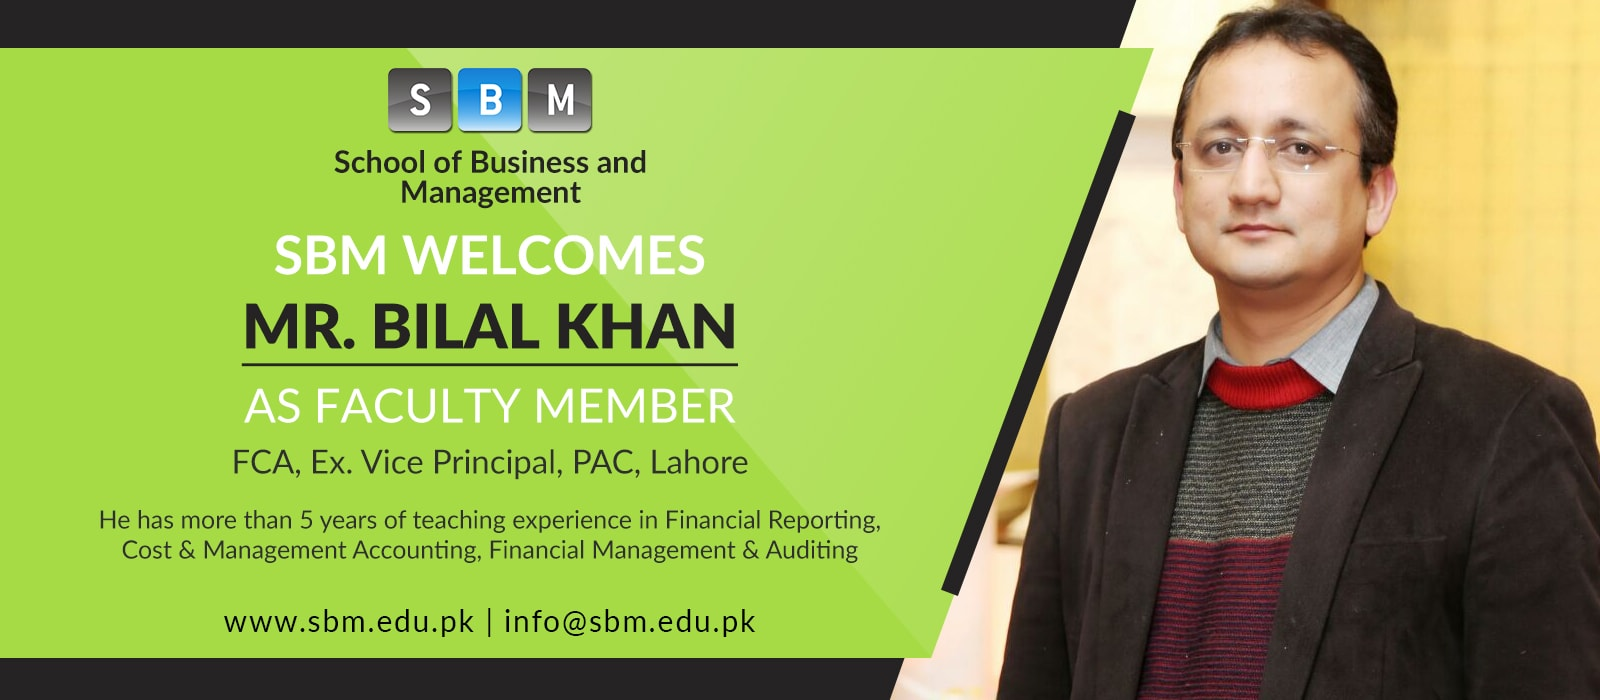 Mr Bilal Khan has joined SBM as Faculty Member